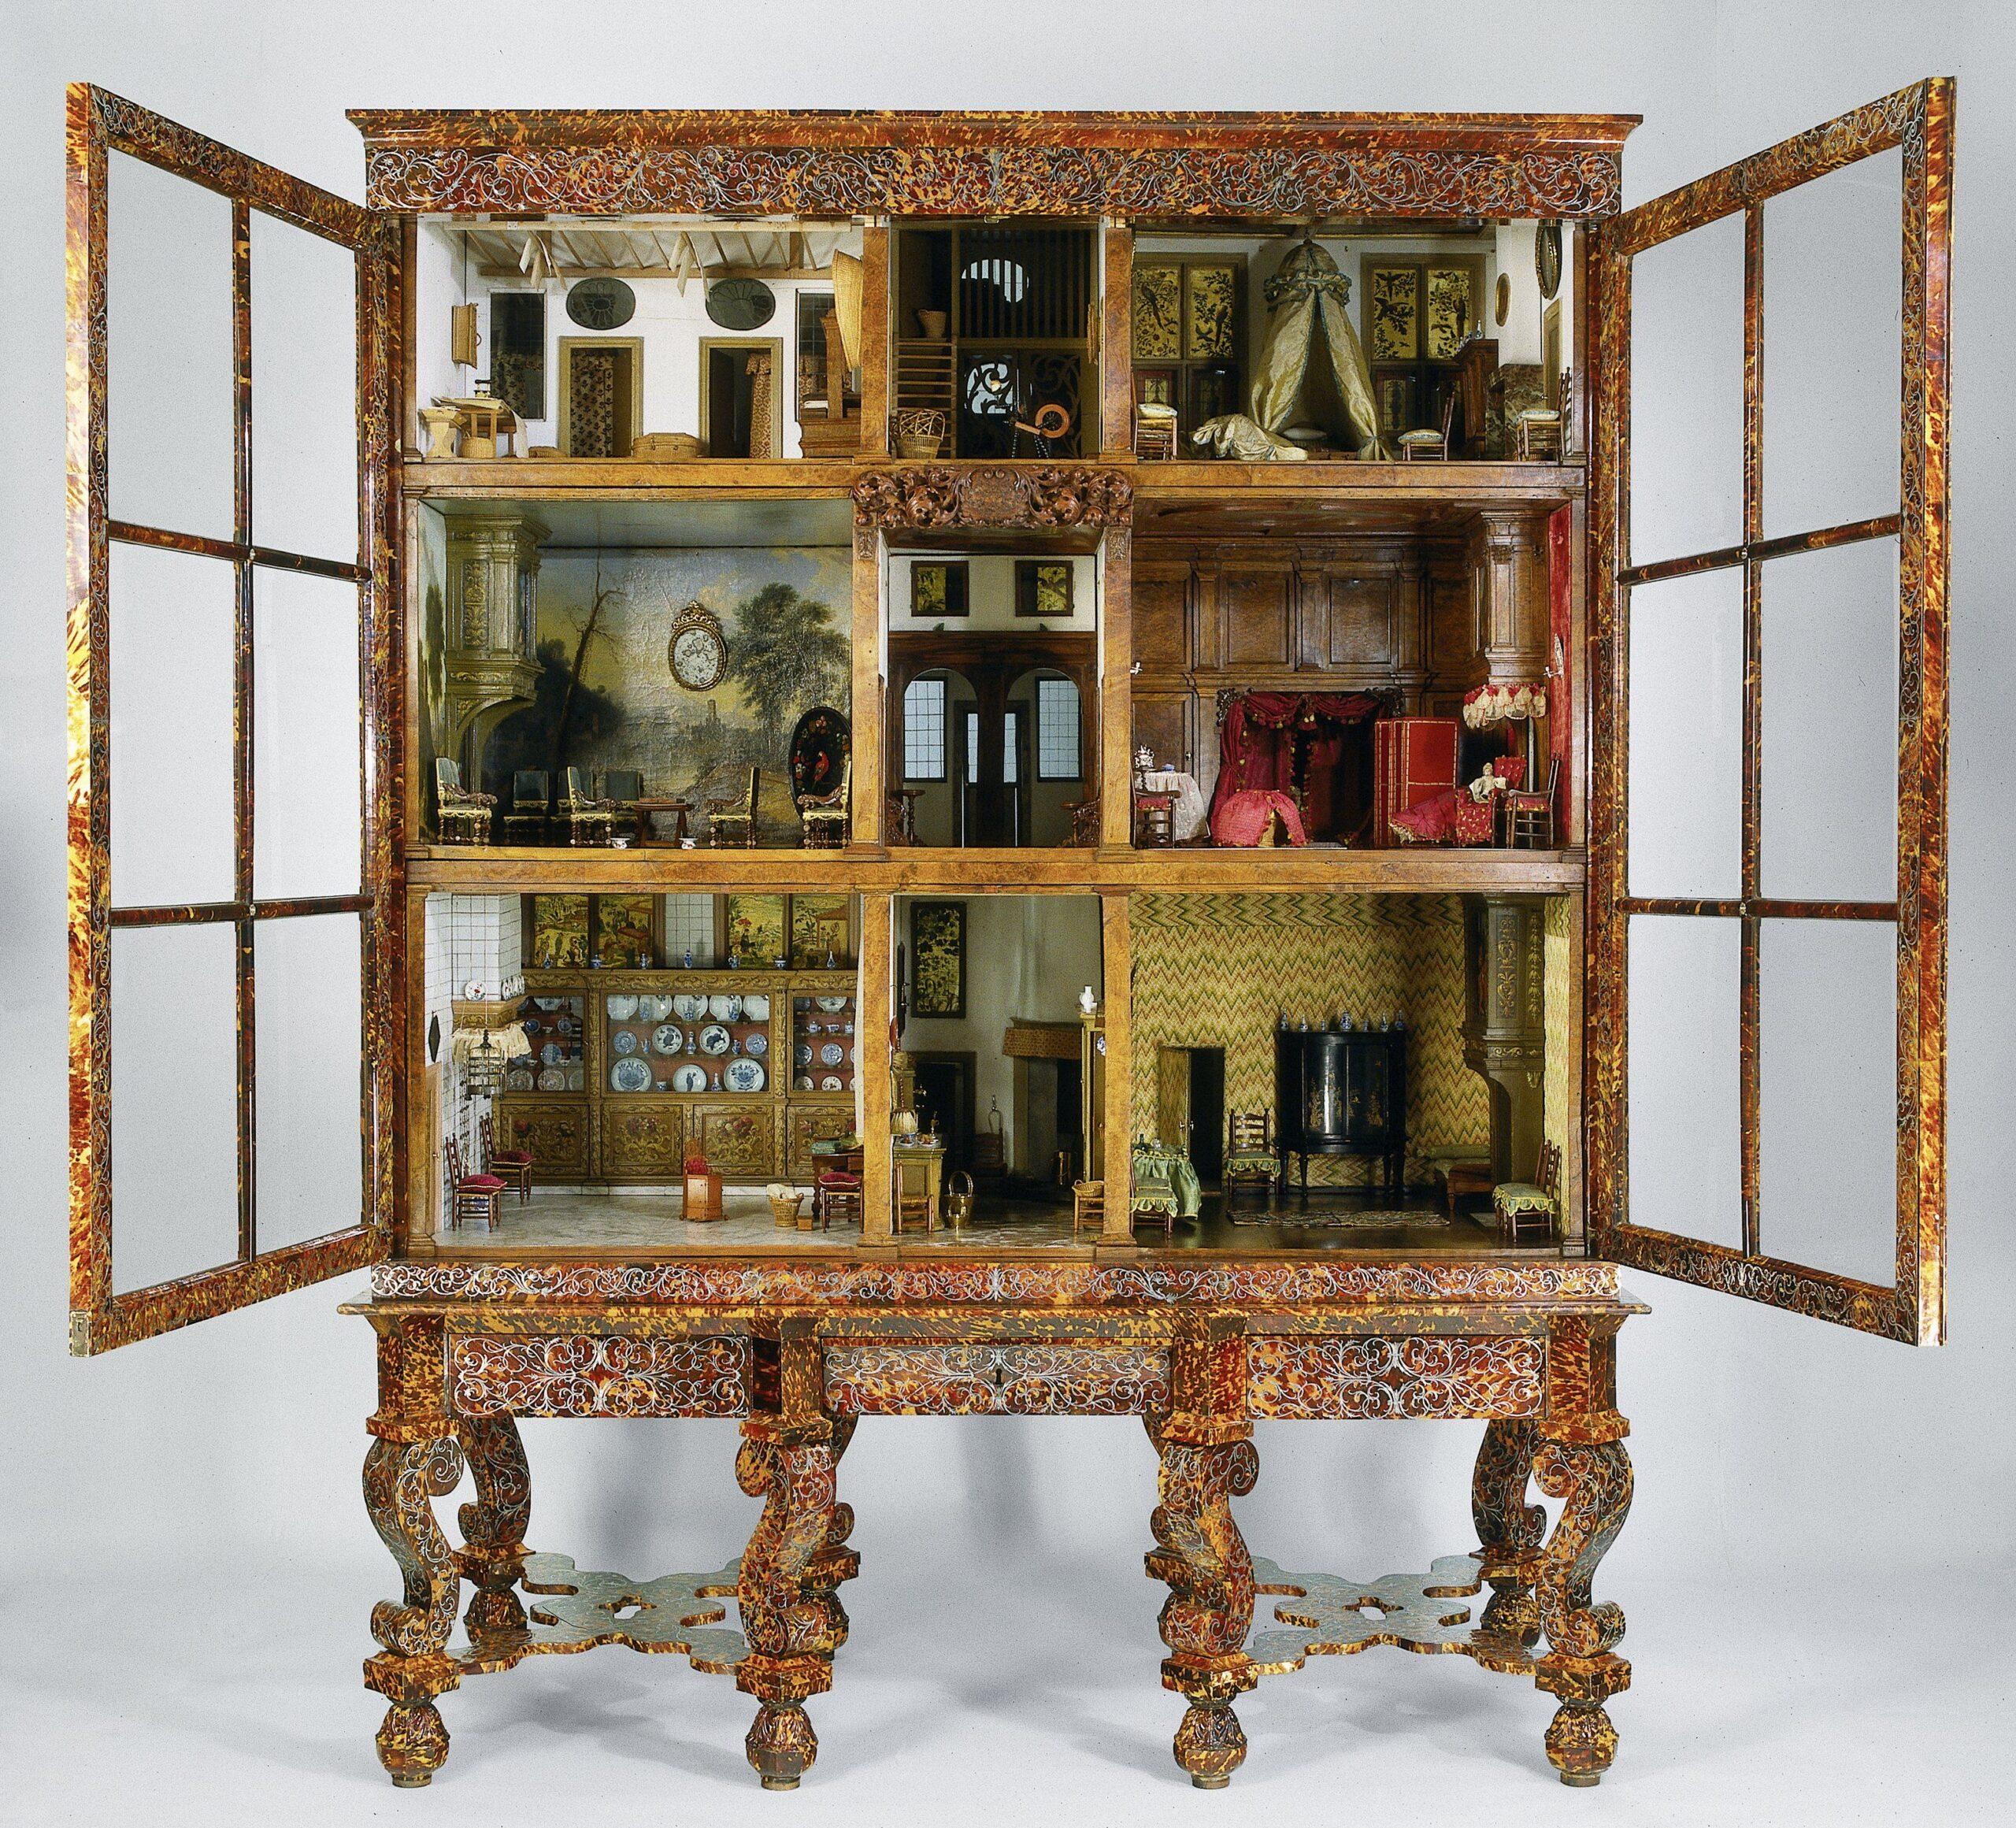 Doll's House of Petronella Oortman, ca. 1686-1710Rijksmuseum, Amsterdam